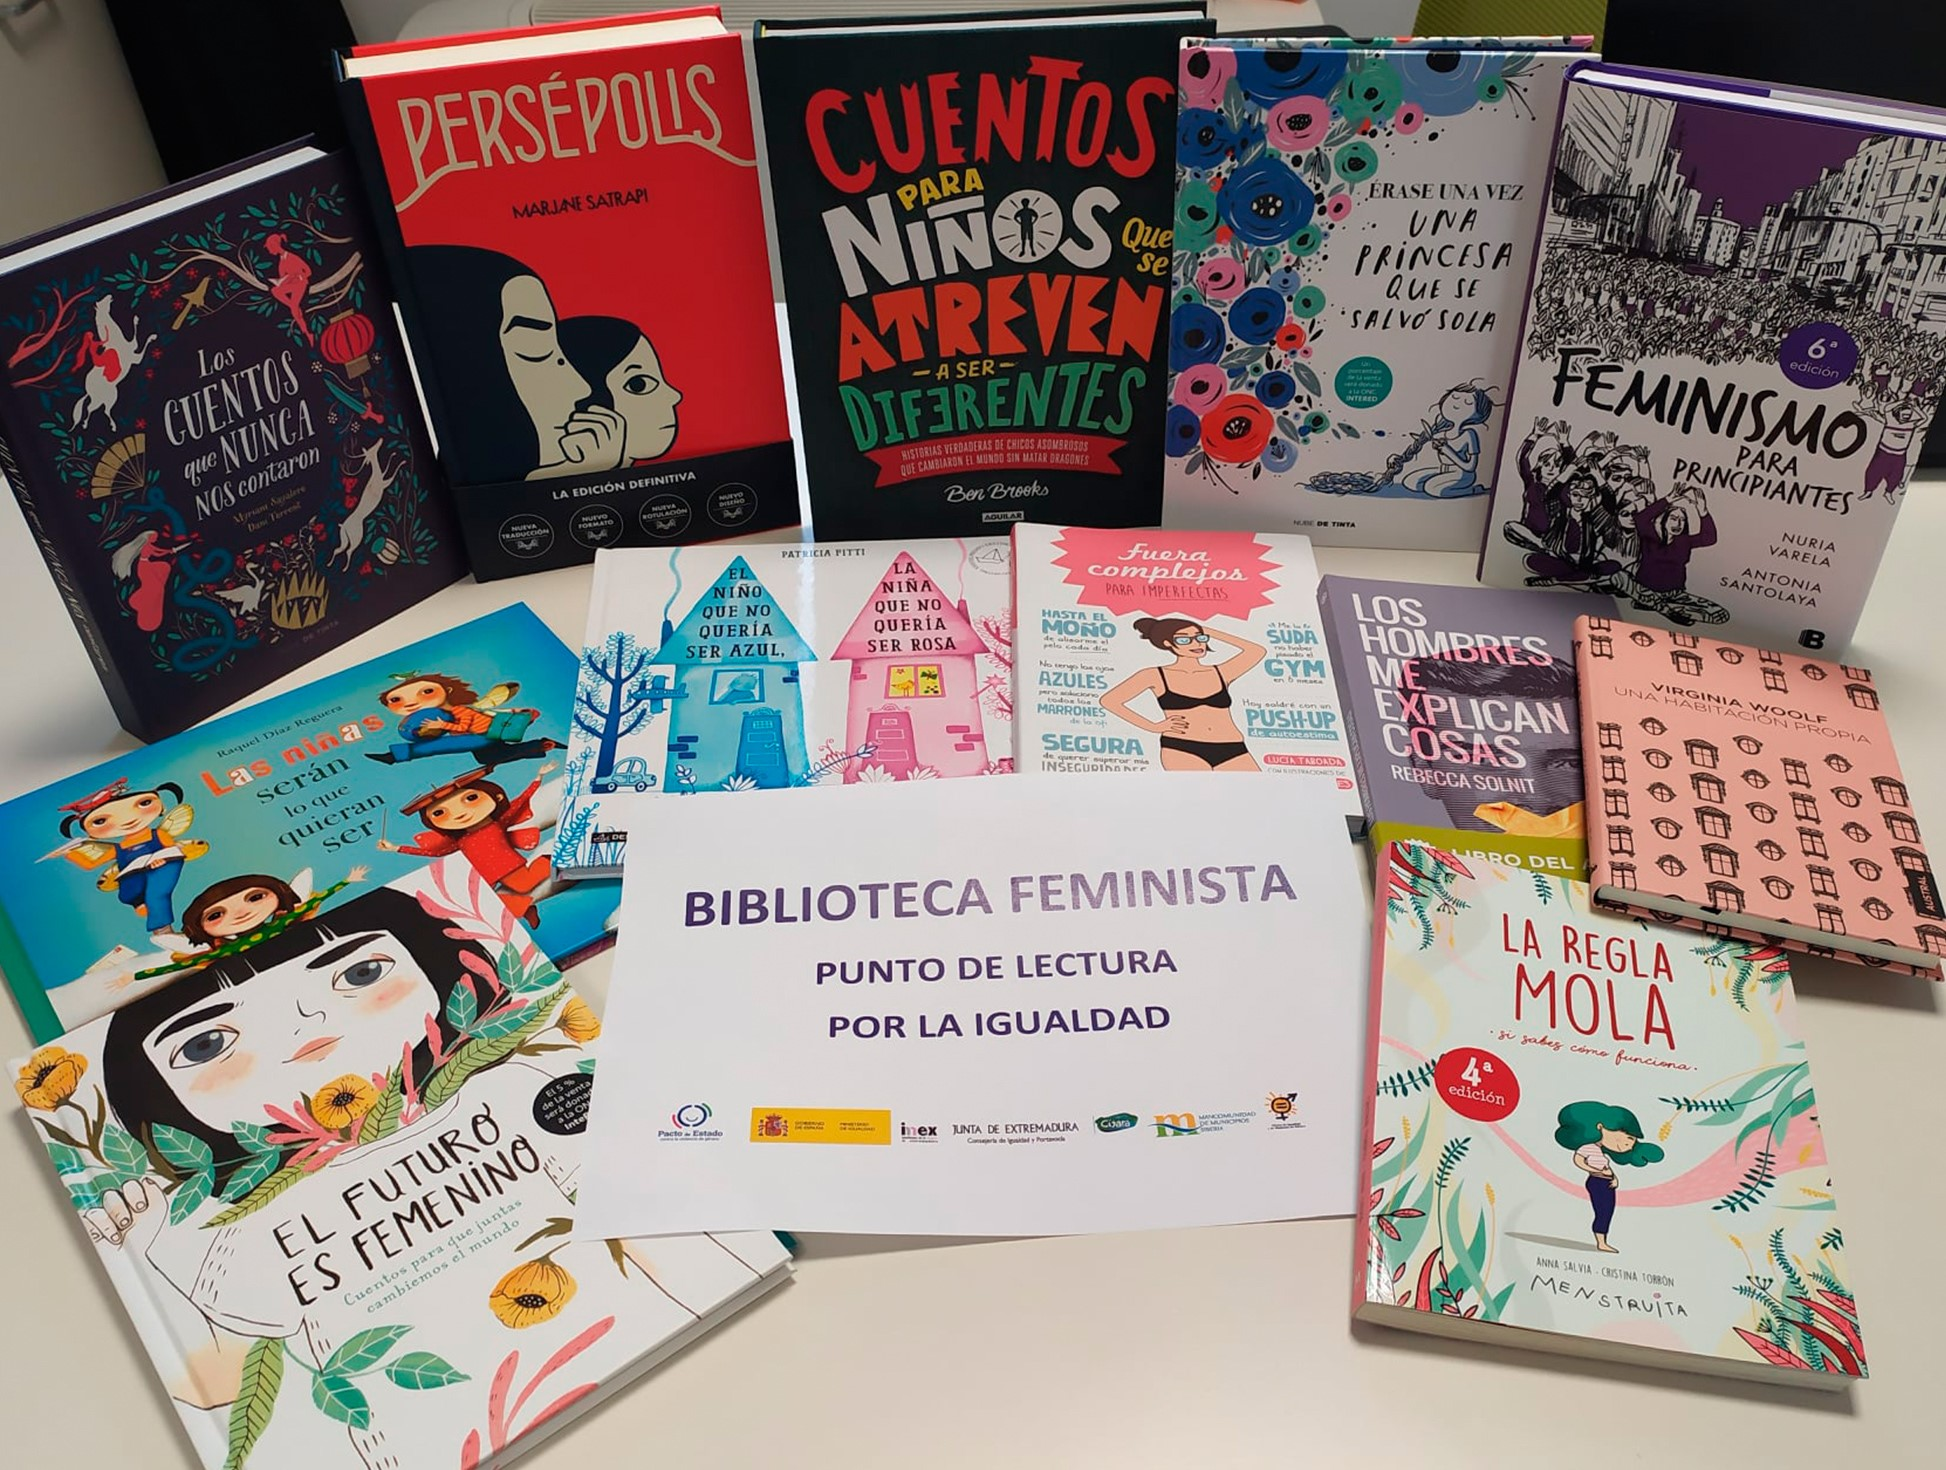 Biblioteca Feminista